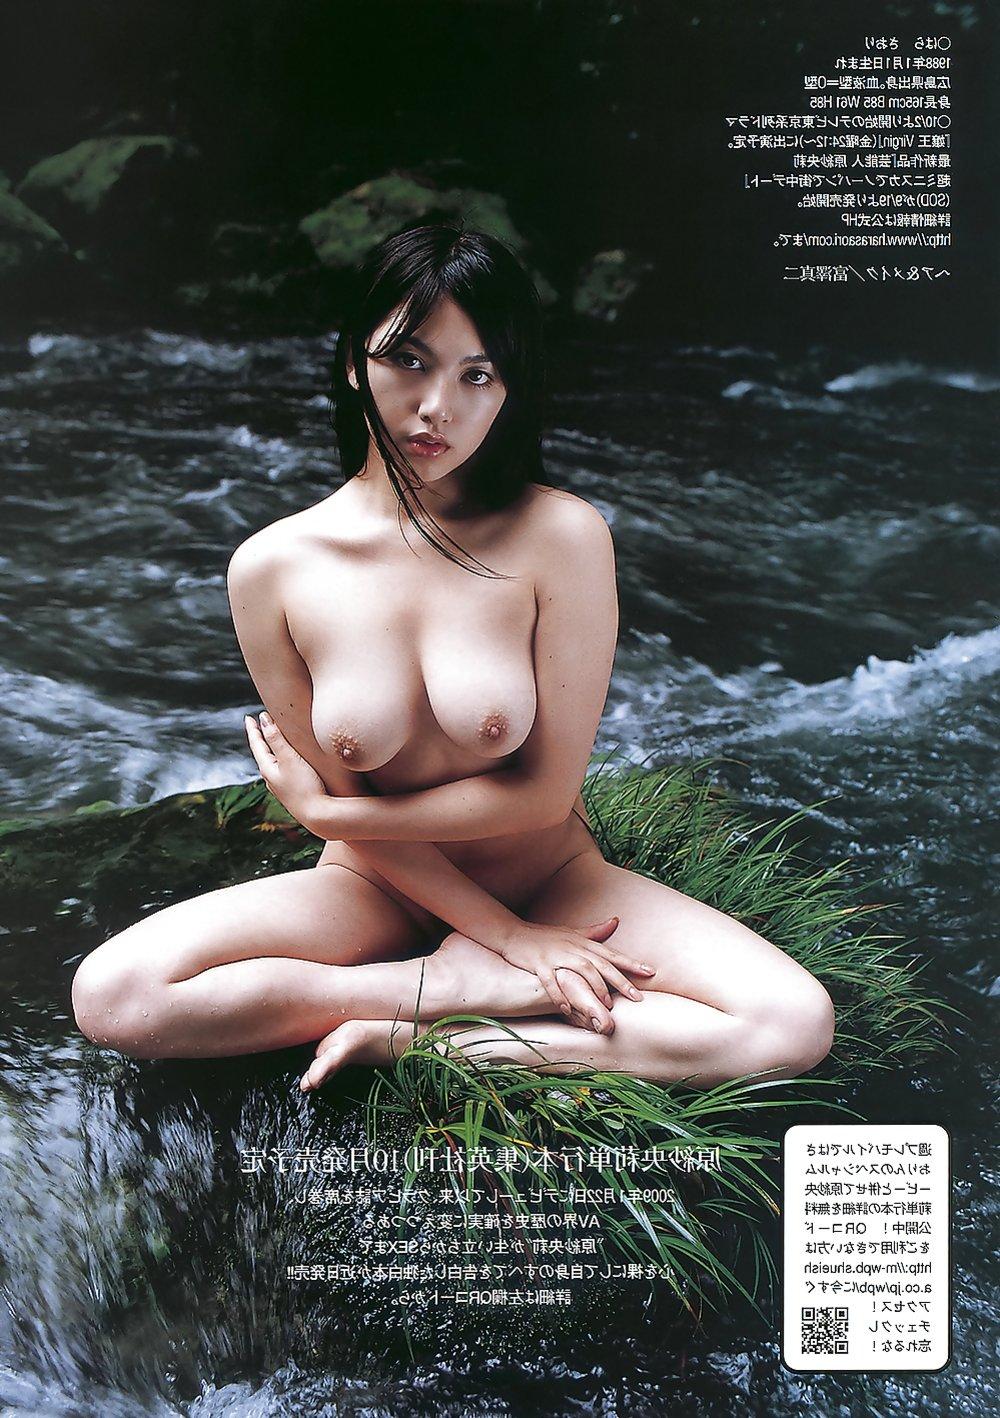 nude japan boy Play